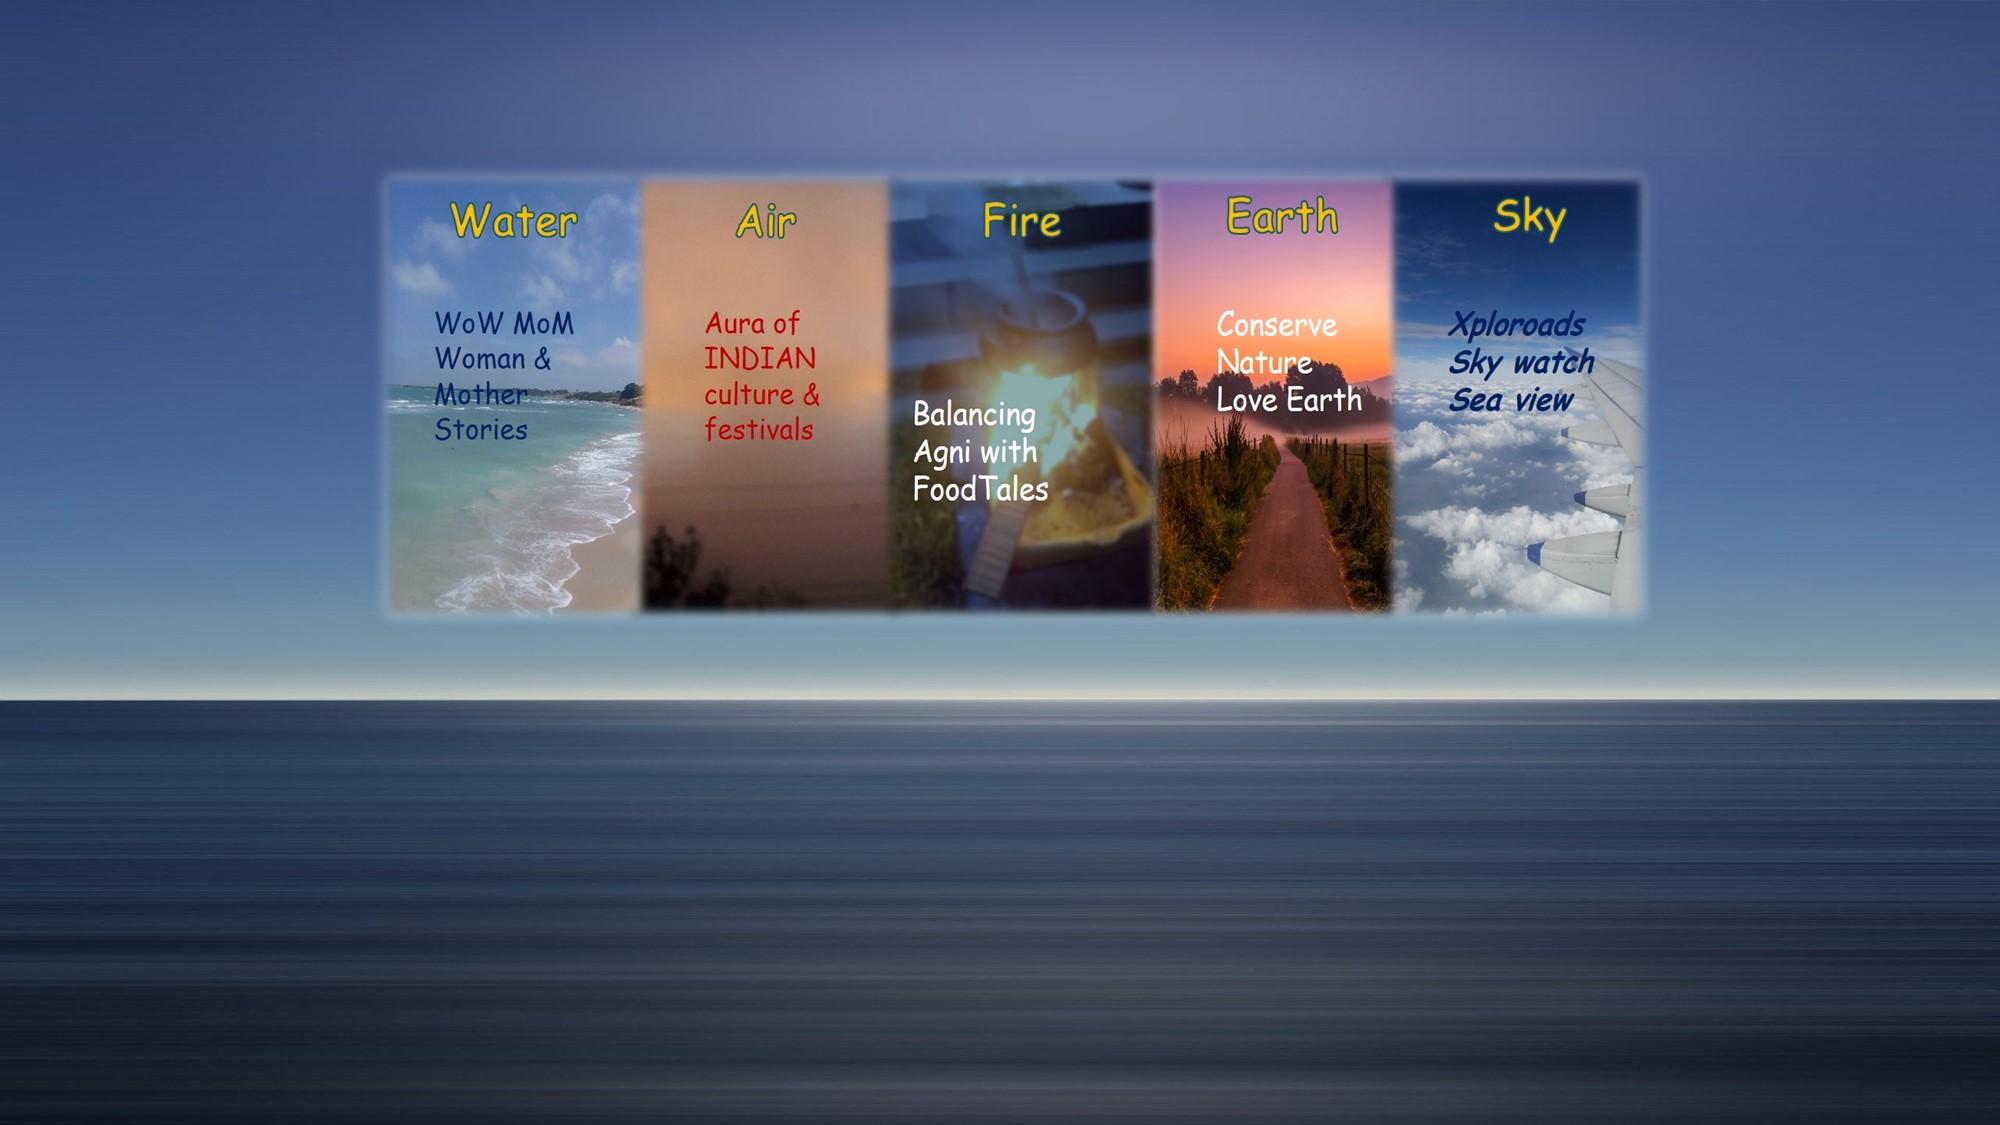 Sun-Sea-Soil-Sky